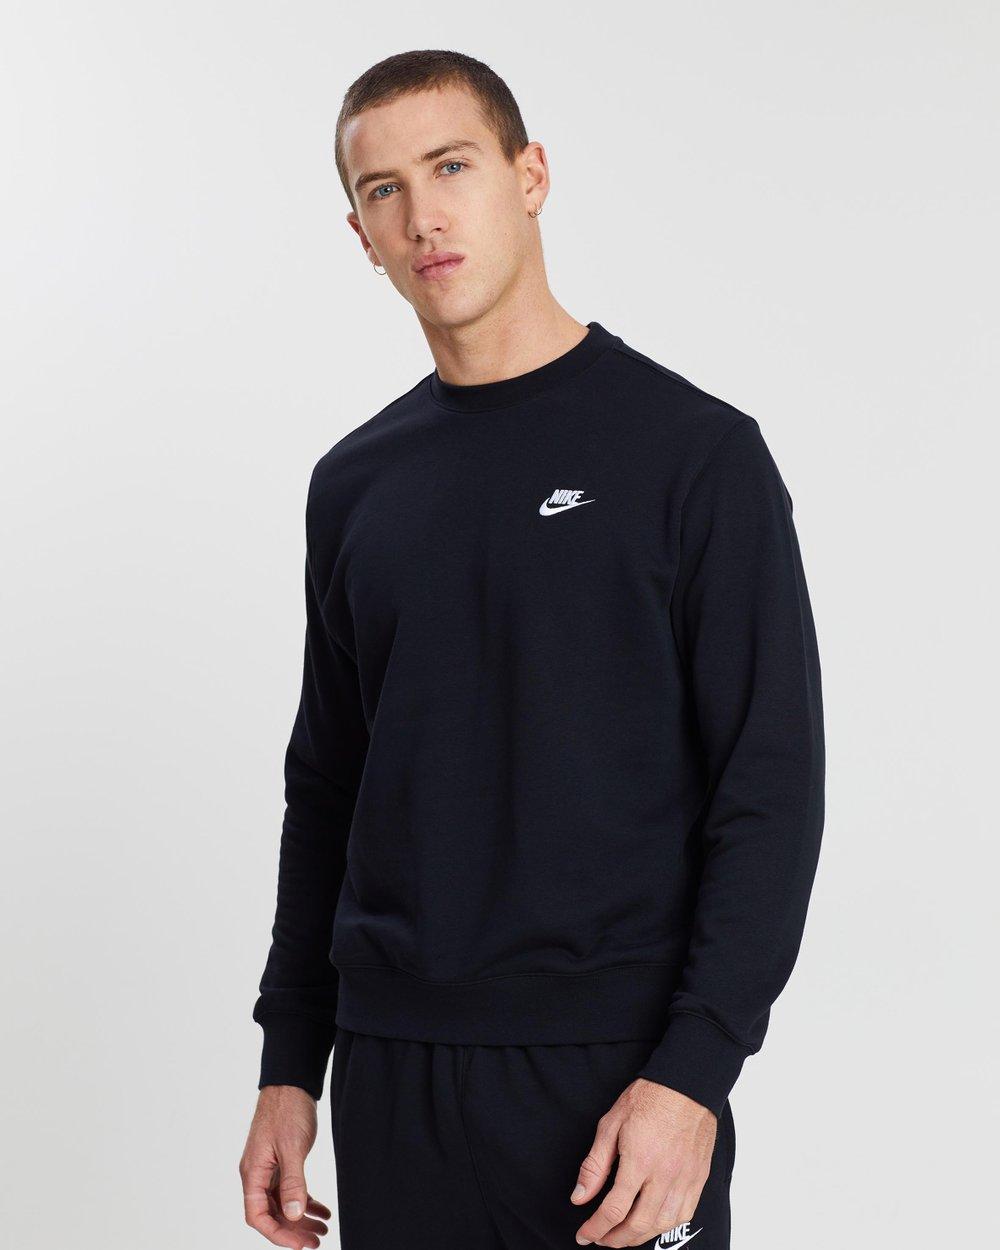 Para buscar refugio gris Alfombra  Sportswear Club French Terry Crew - Men's by Nike Online | THE ICONIC |  Australia